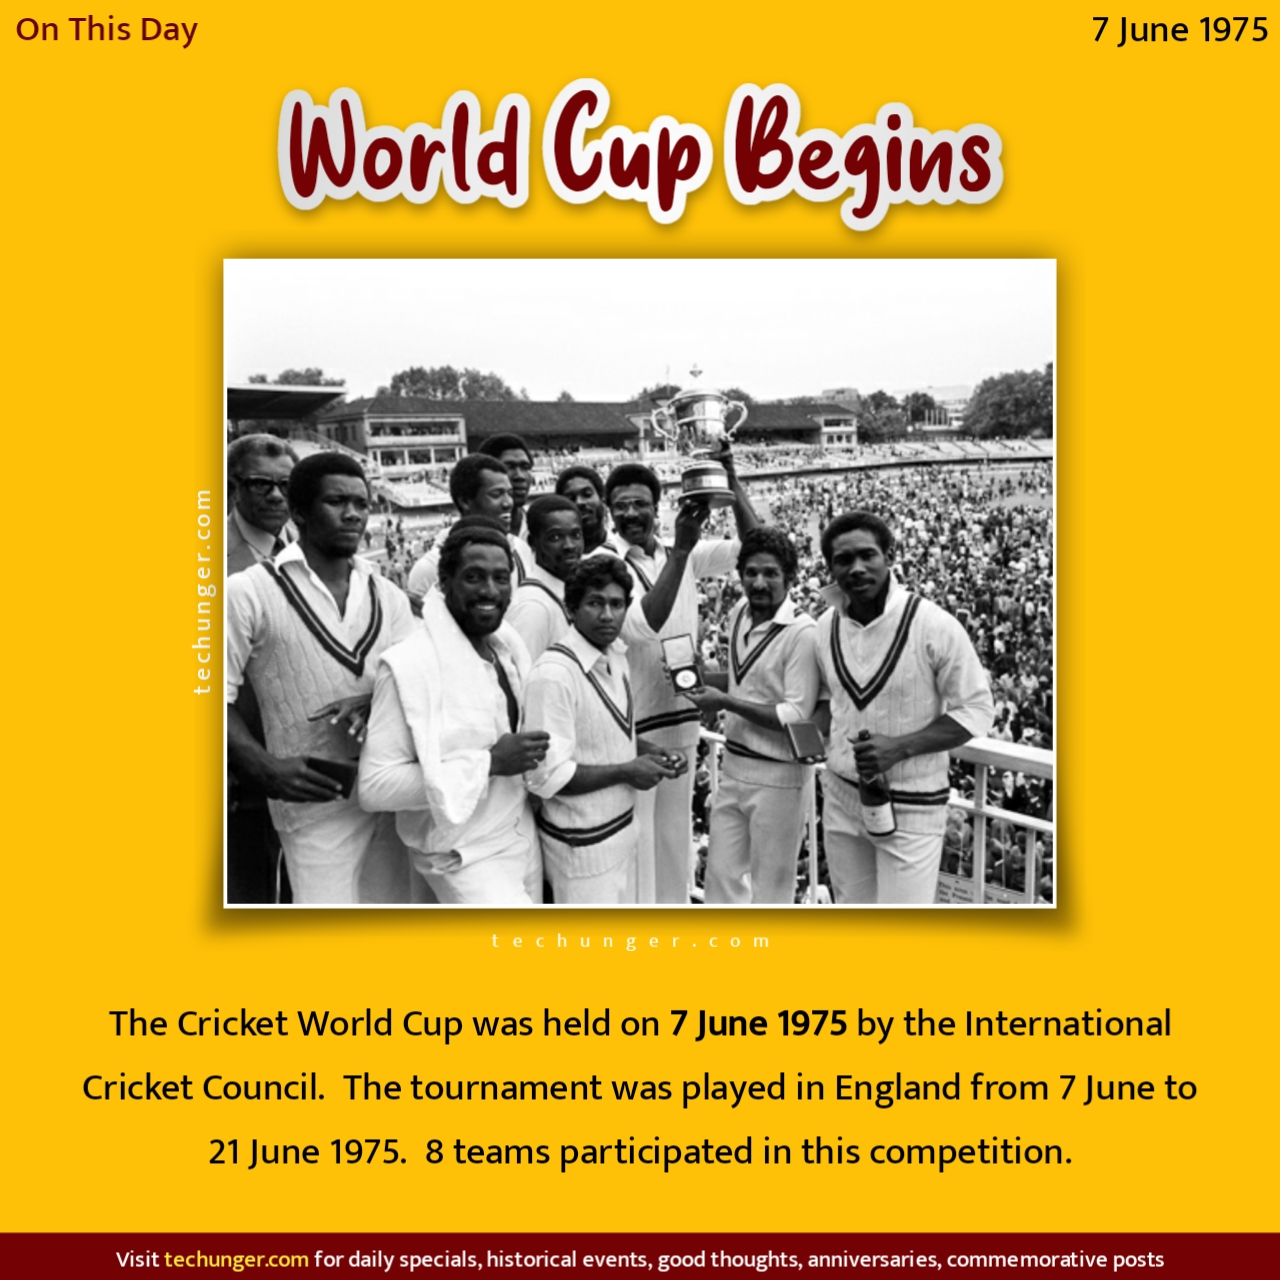 first World cup played, 2021-06-07, 07/06/2021, 7 Jun, 7 Jun 2021, 7 Jun dinvishesh, 7 Jun techunger, ०७/०५/२०२१, ०७ जून दिनविशेष, ०७ जून घटना, ७ जून जन्मदिन, ७ जून स्मृतिदिन, ७ जून इतिहास, techunger, Saurabh Chaudhari, marathi quotes, hindi quotes